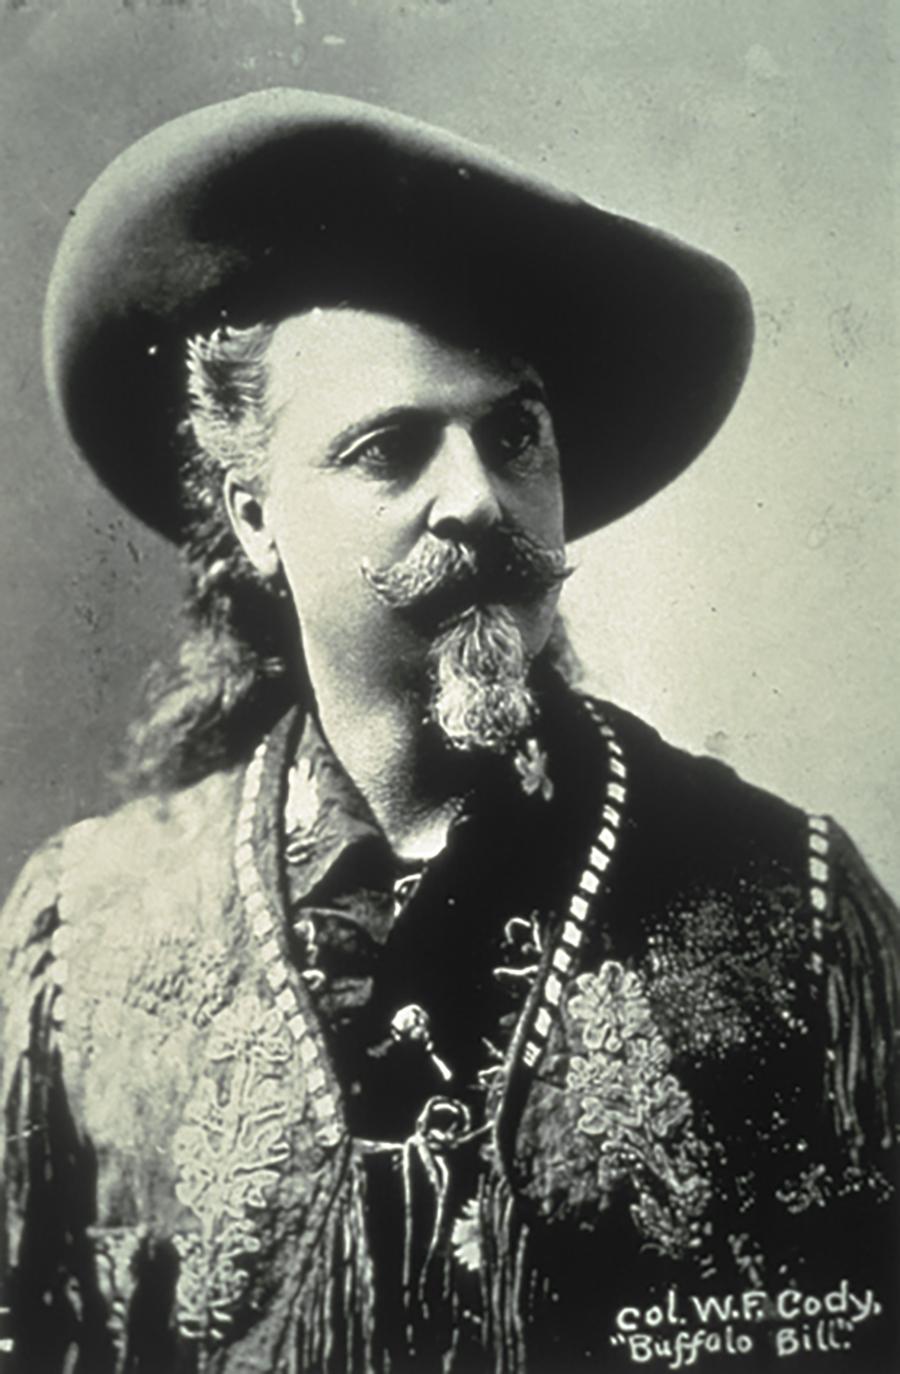 A vintage sepia-toned headshot of Buffalo Bill in his signature buckskin and fringe.